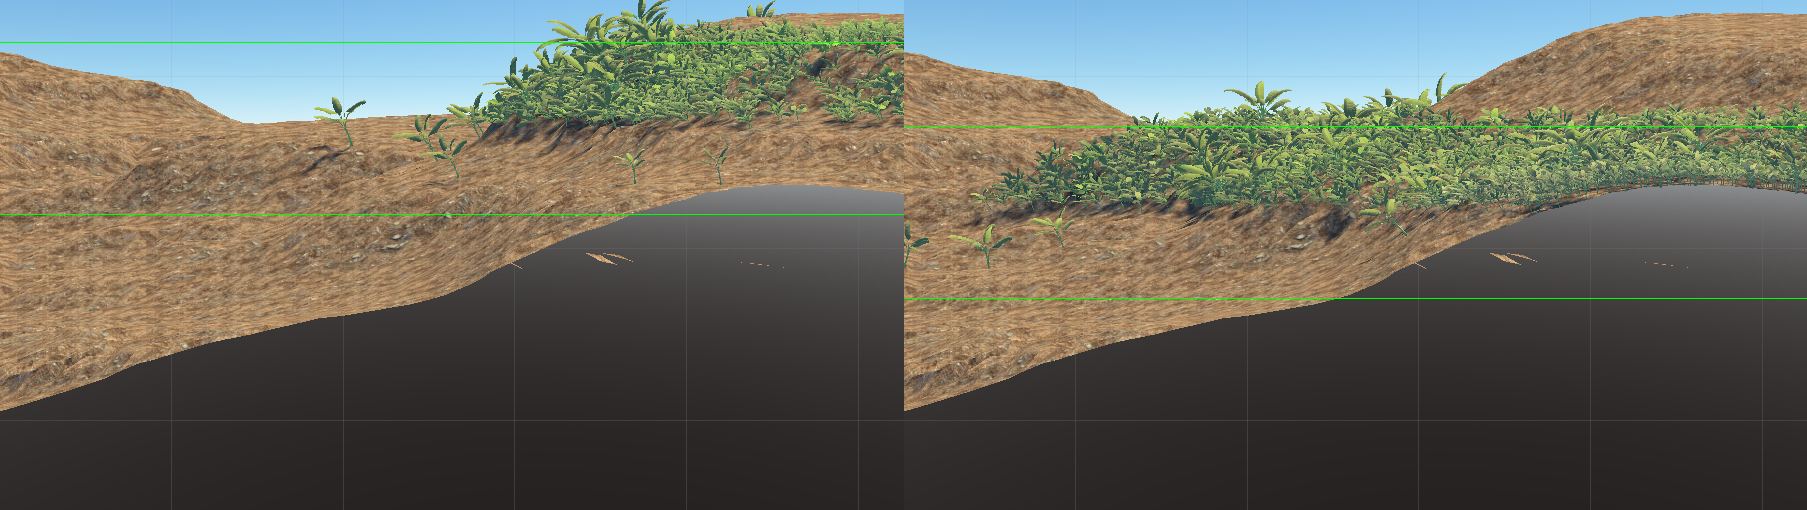 Landscaper - A tool for procedural foliage placement - Unity Forum